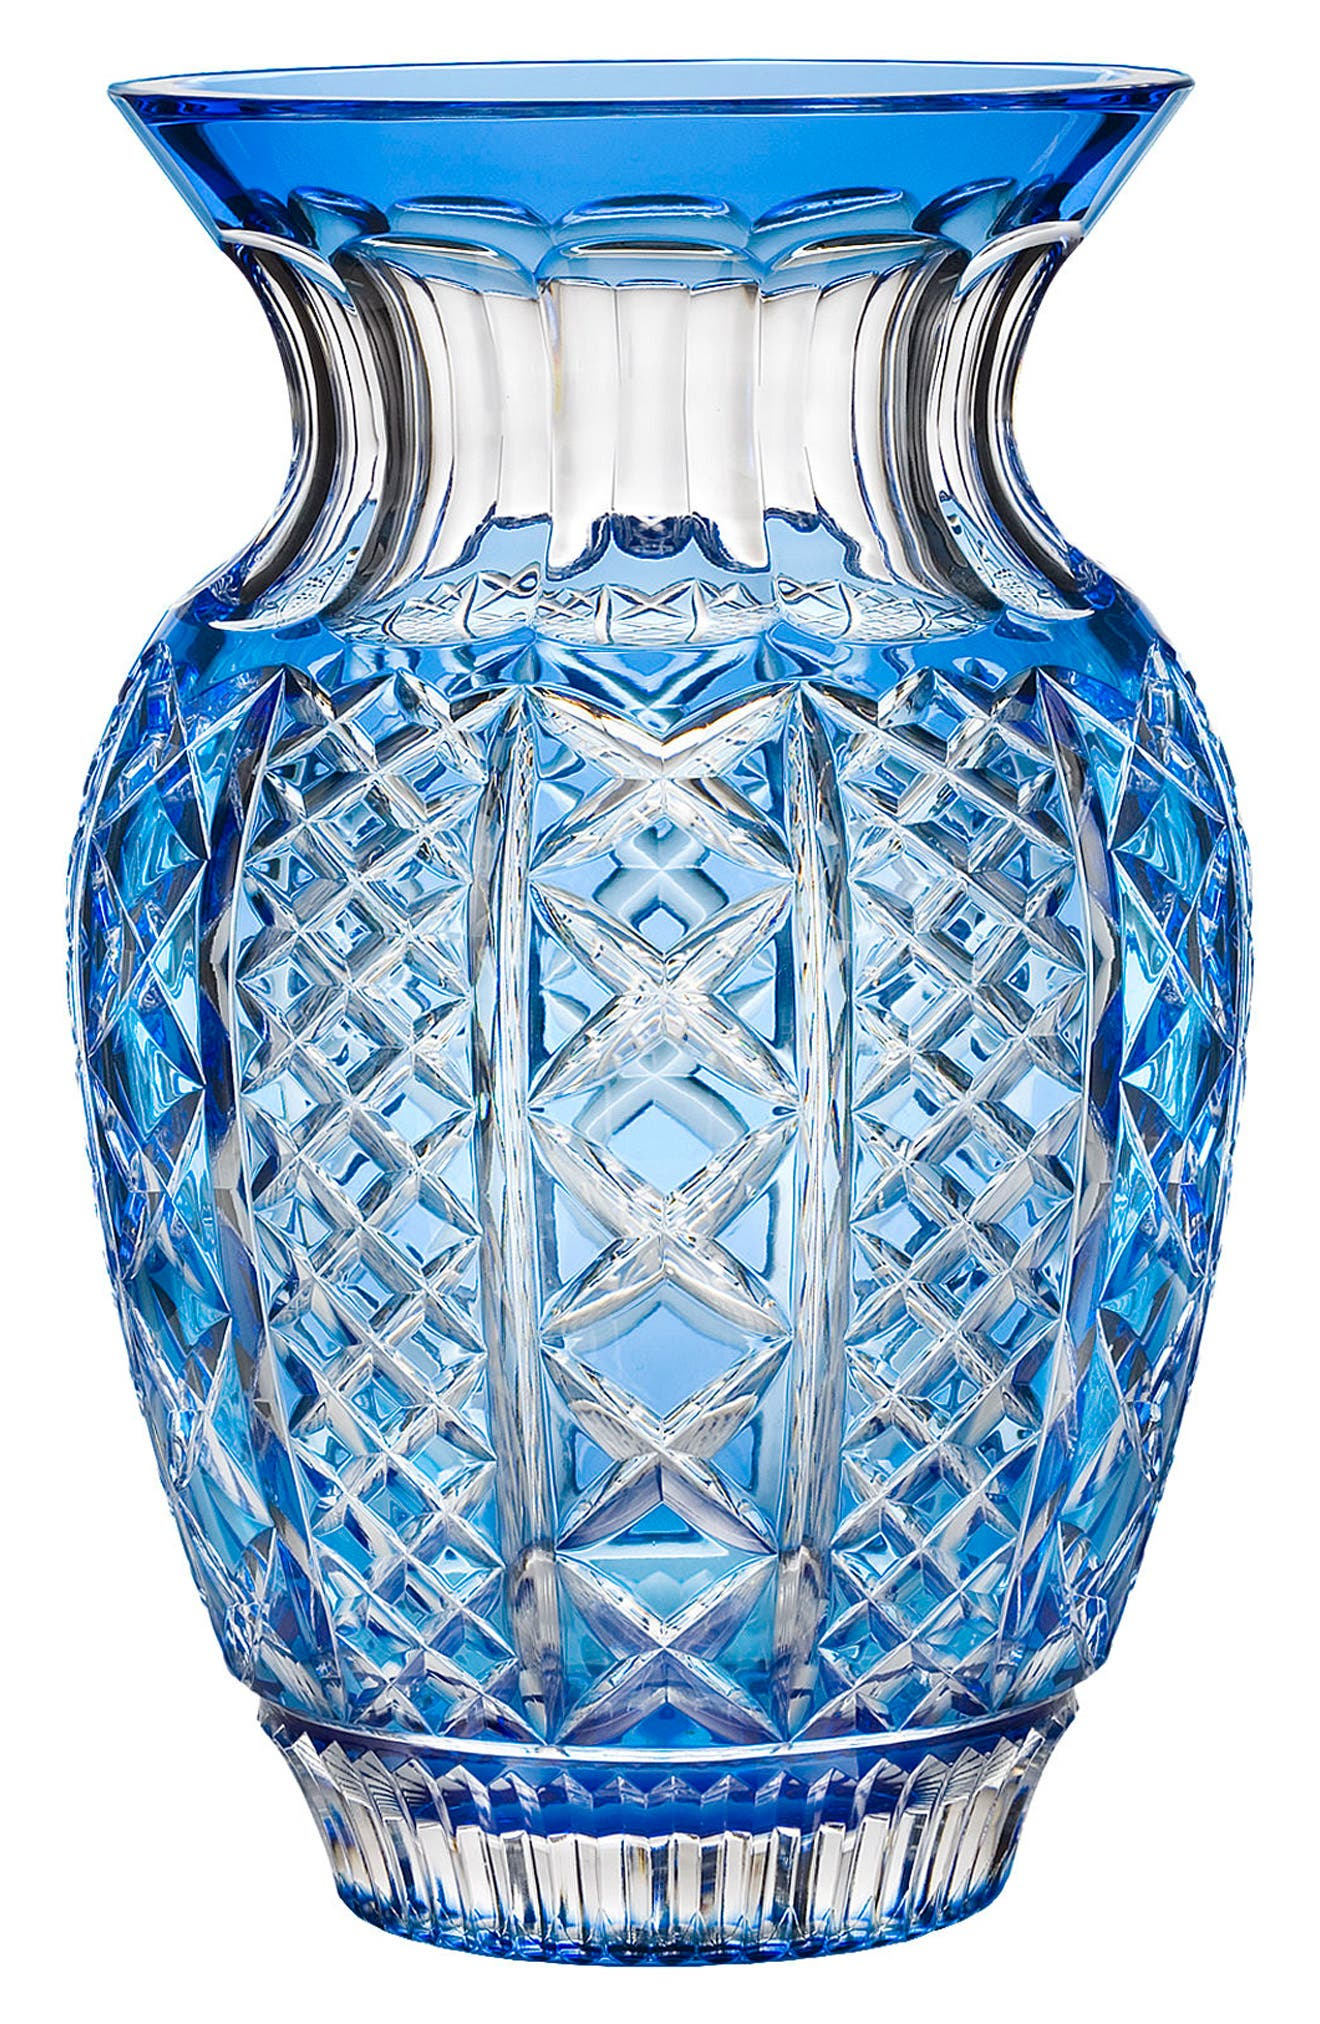 Waterford Fleurology Jeff Leatham Molly Blue Bouquet Vase